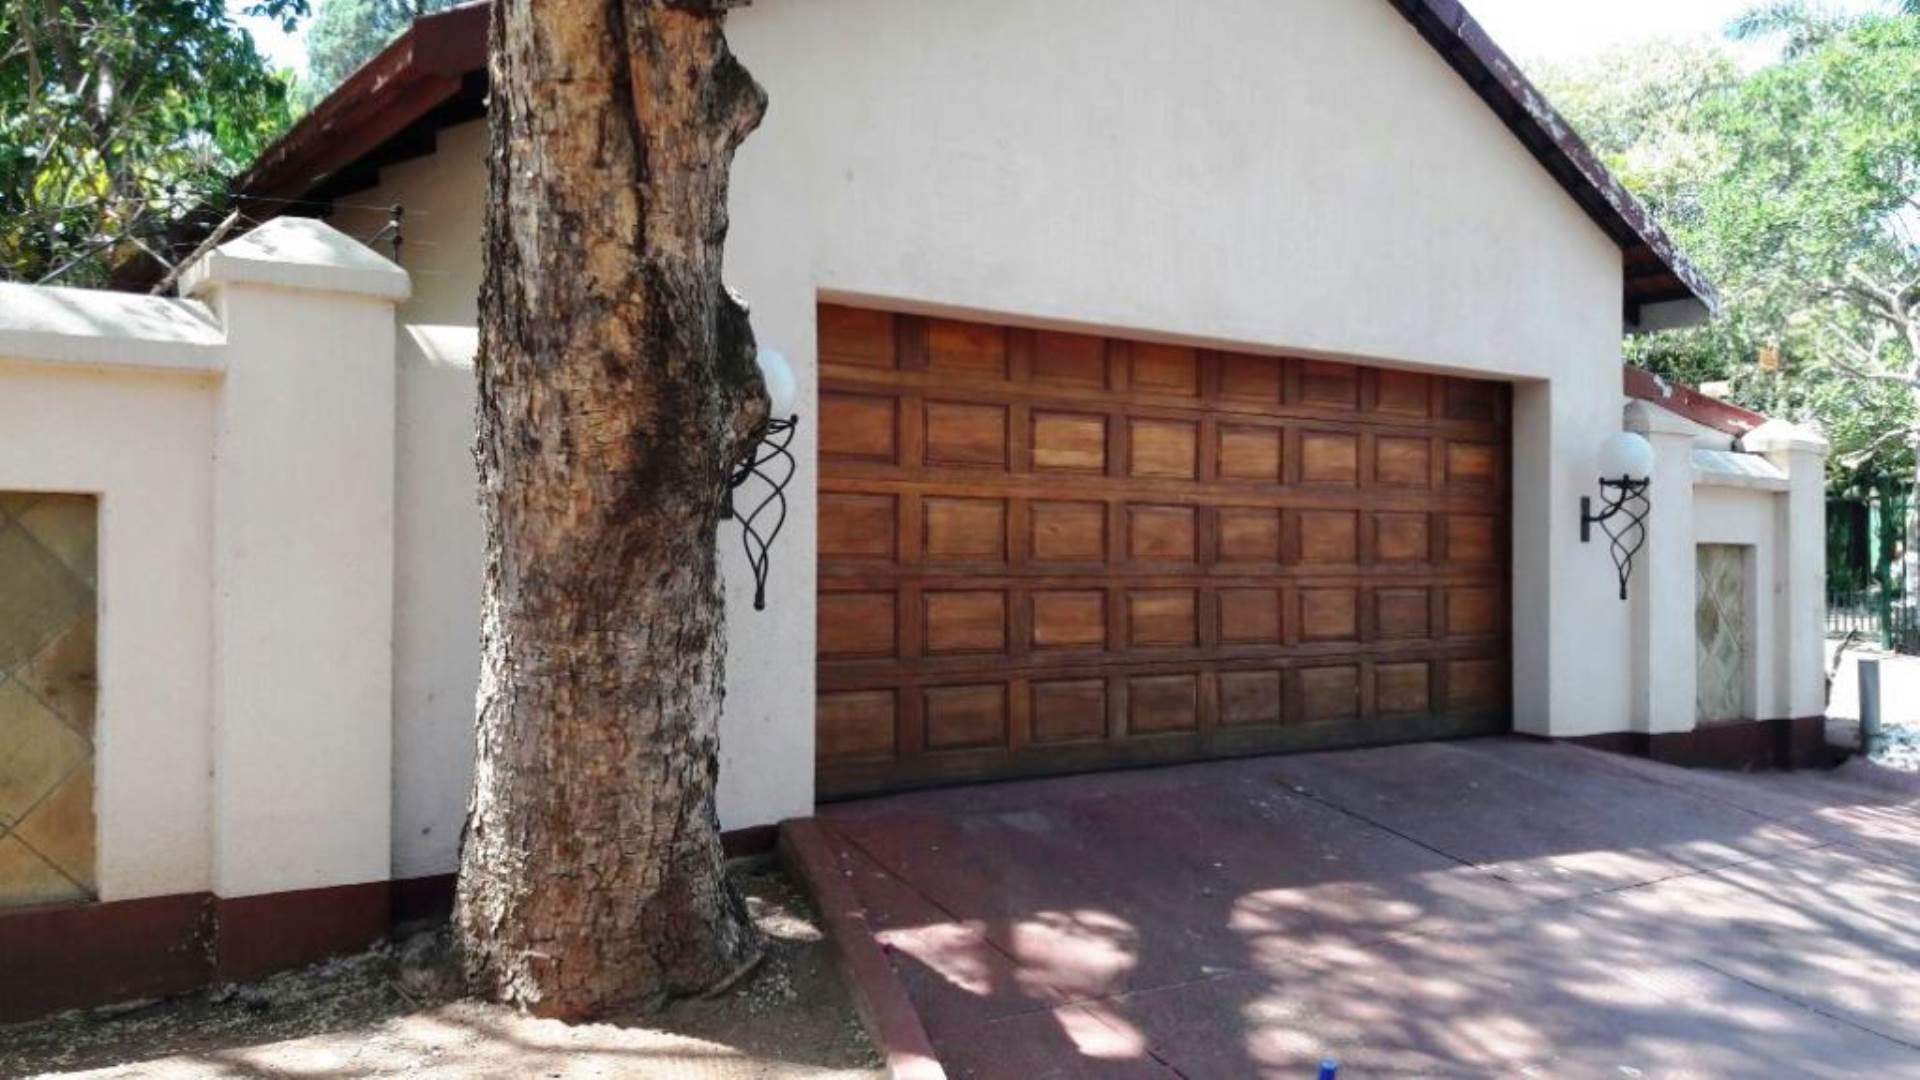 3 BedroomHouse For Sale In Bela Bela (Warmbaths)